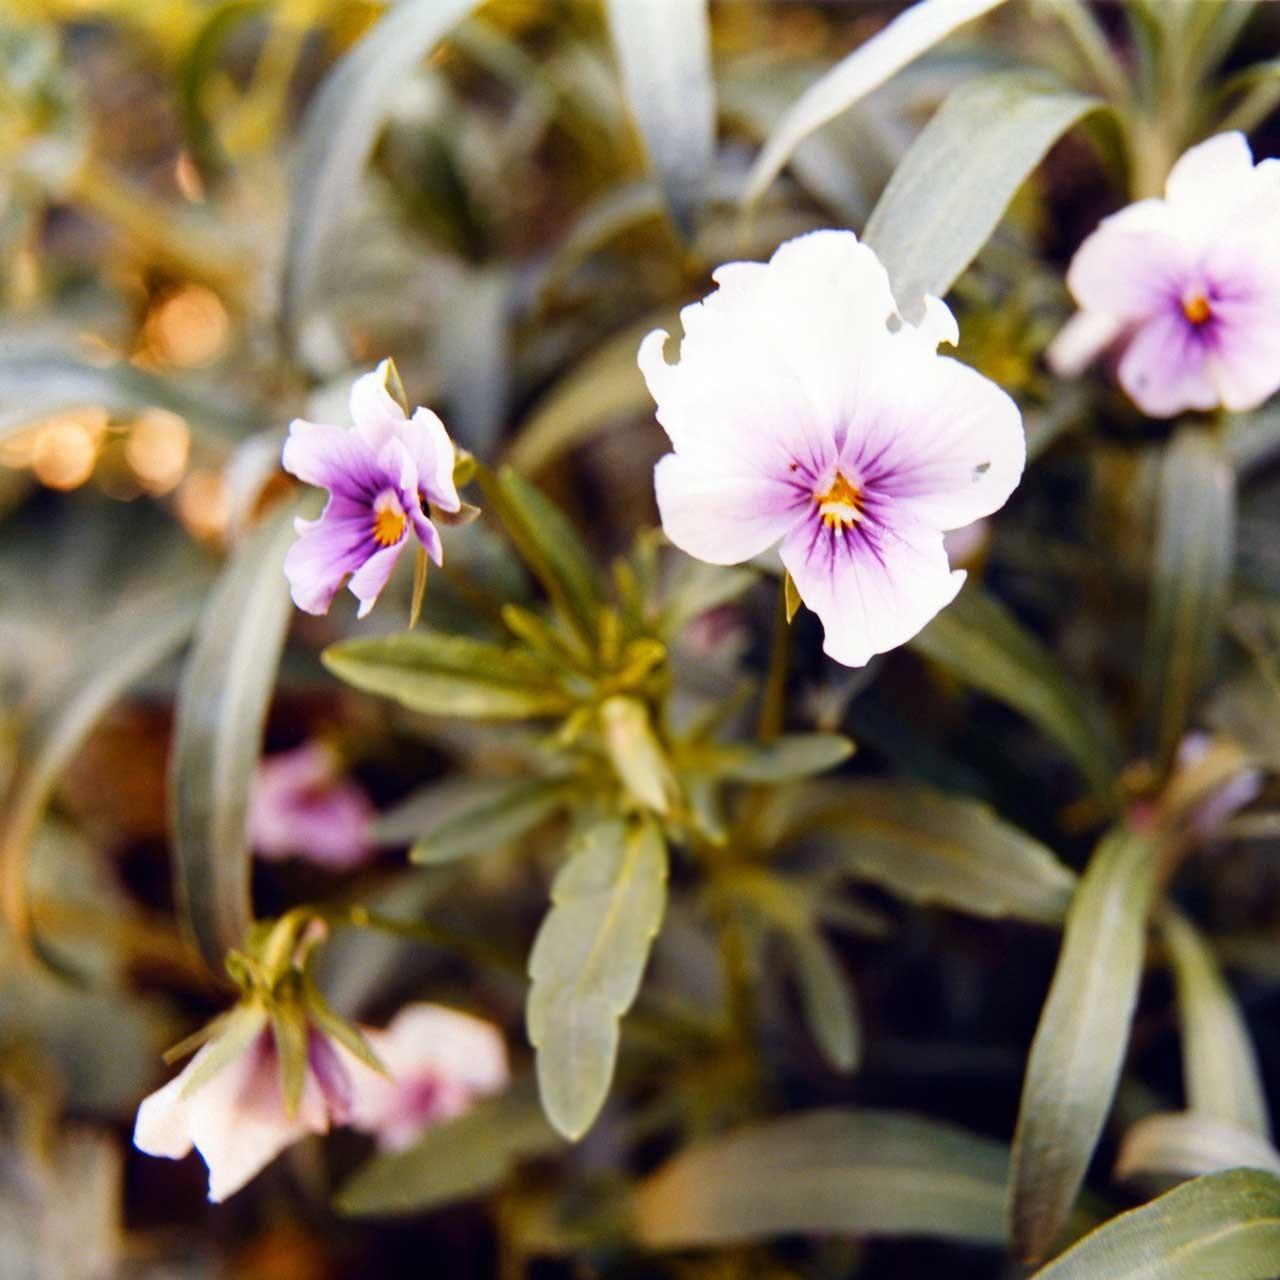 Laure-Maud_04_photographe_jardin-fleurs_01